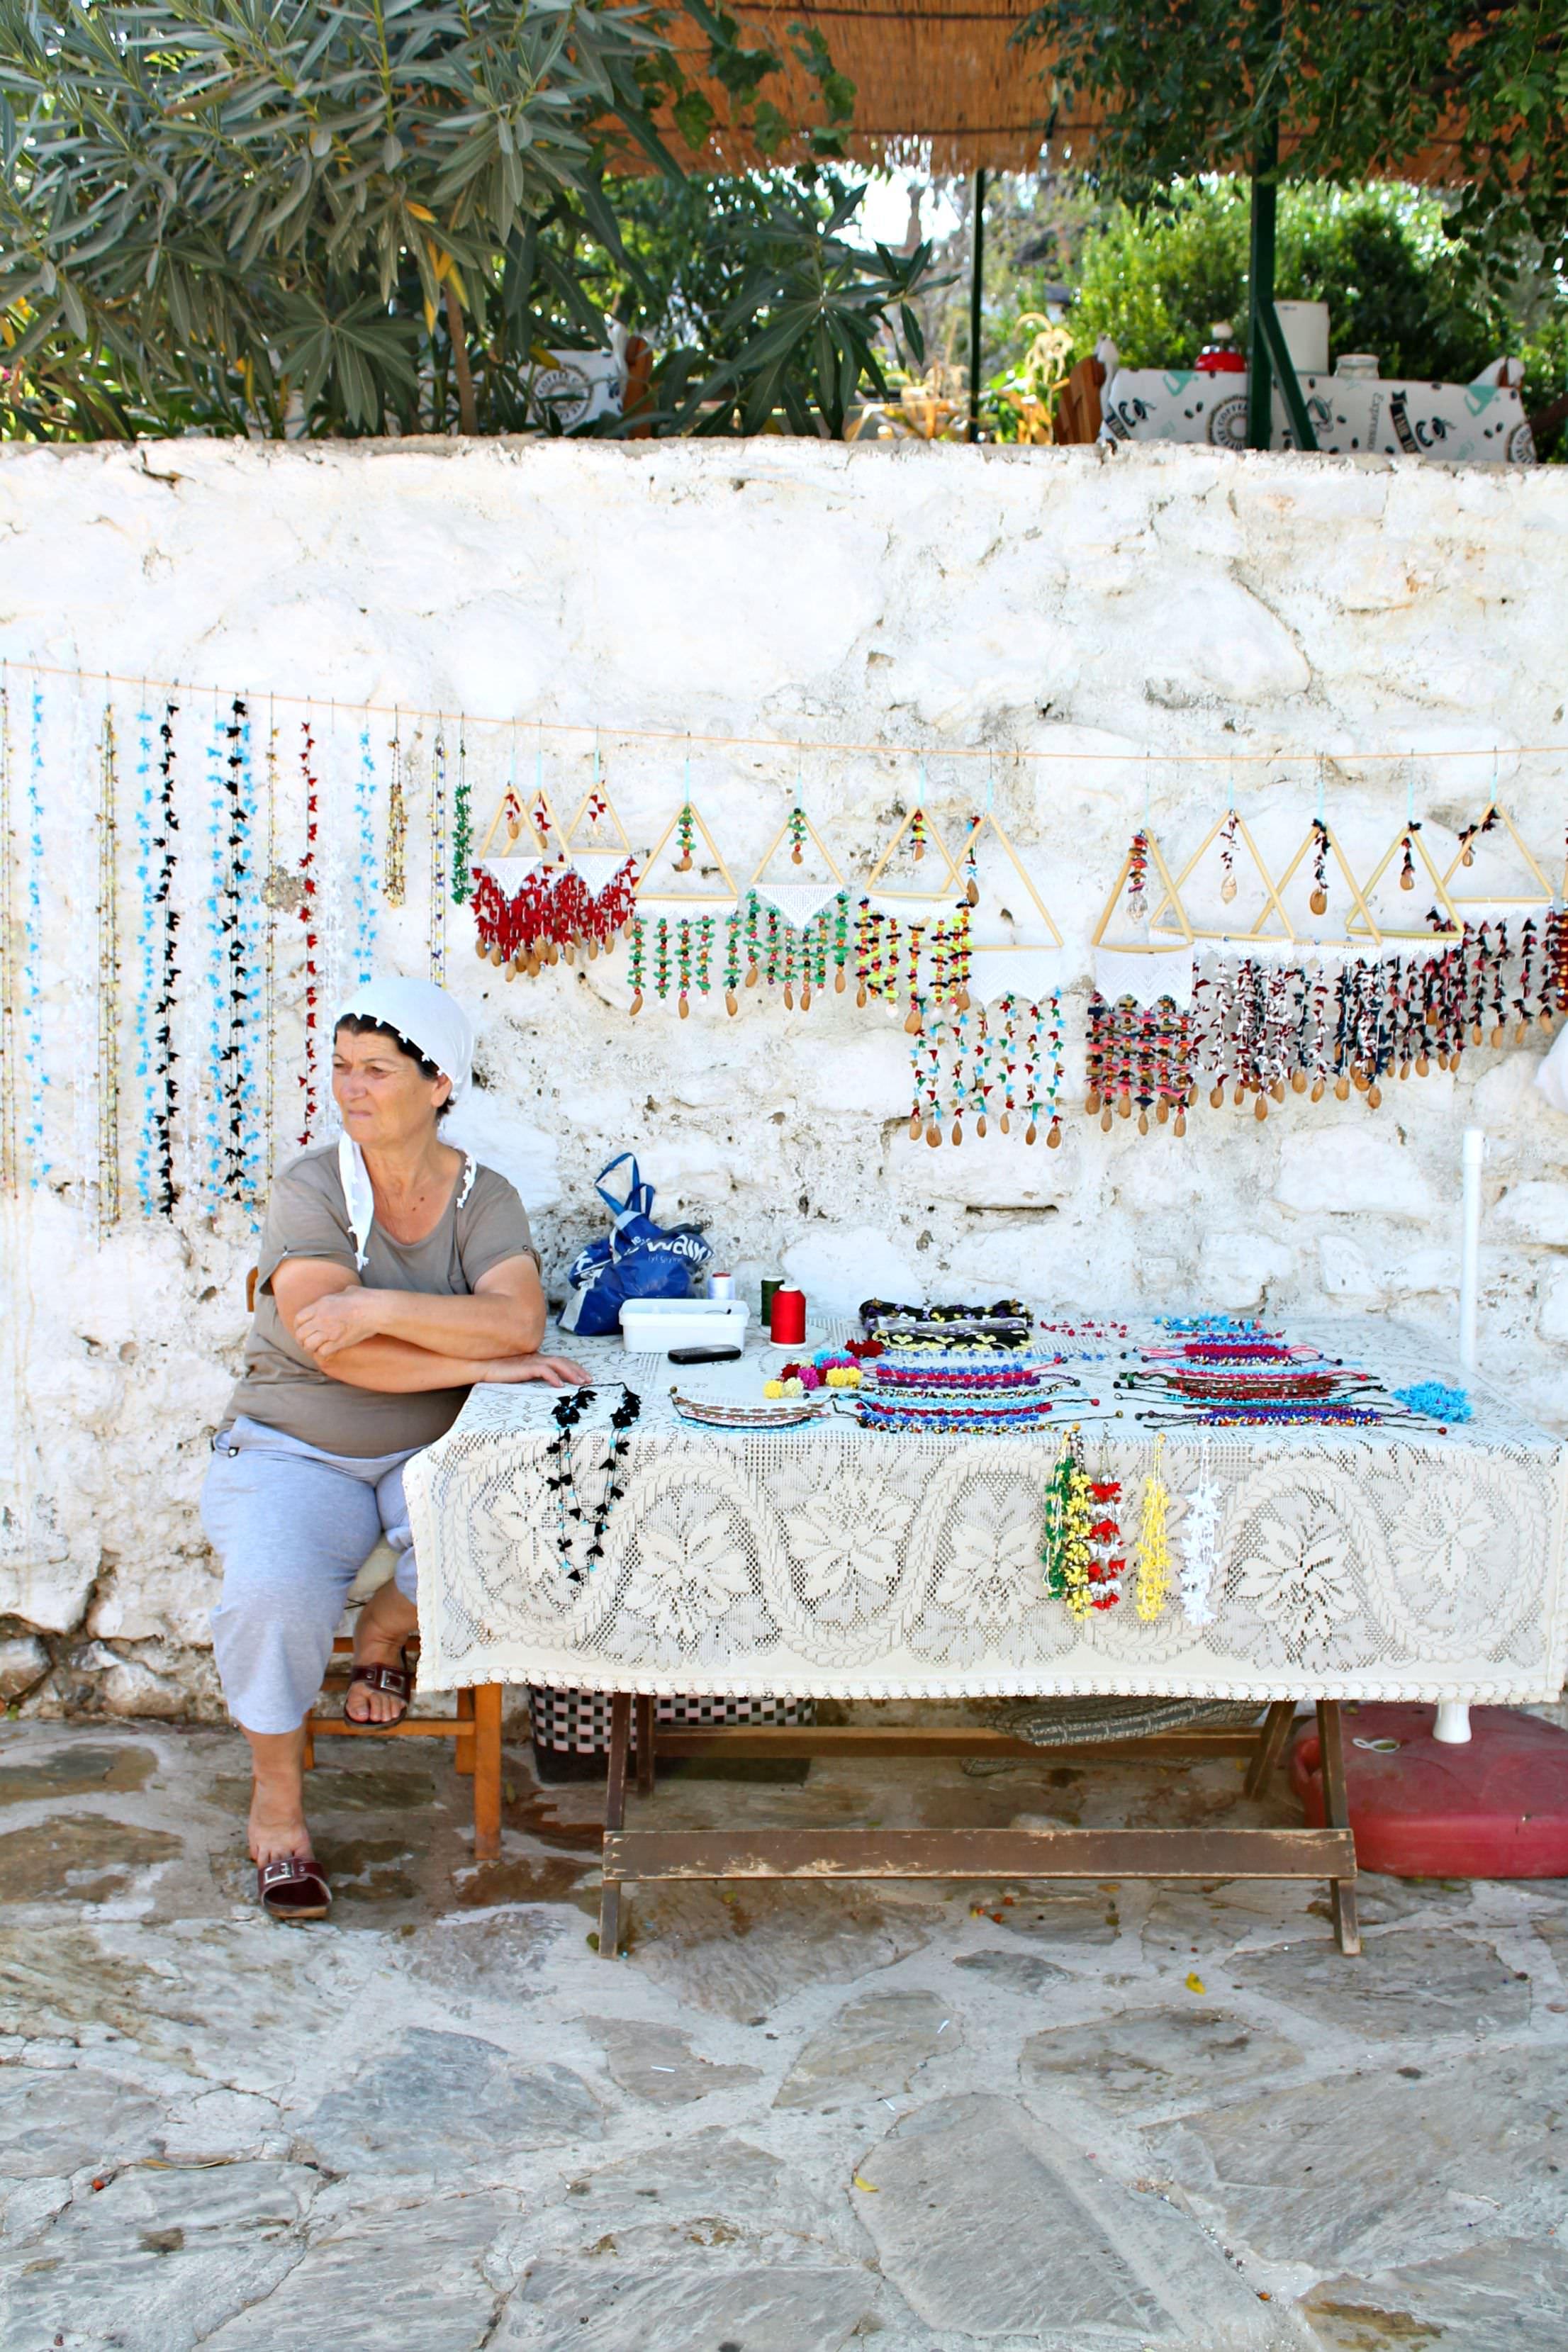 Eski-Datca-Turkey-street-vendors-photo-by-Little-Big-Bell